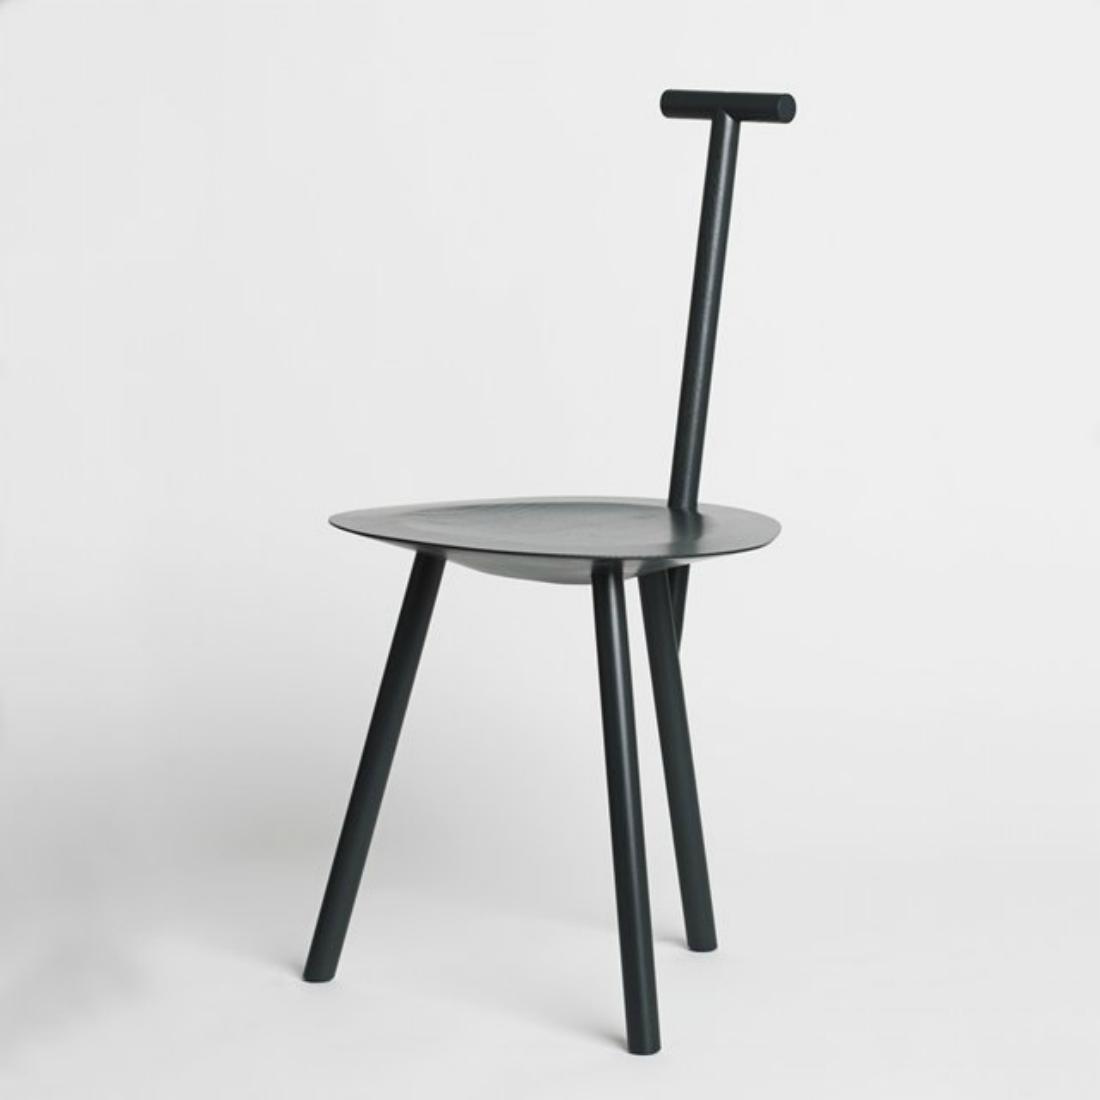 Designapplause Batch Spade Chair Faye Toogood